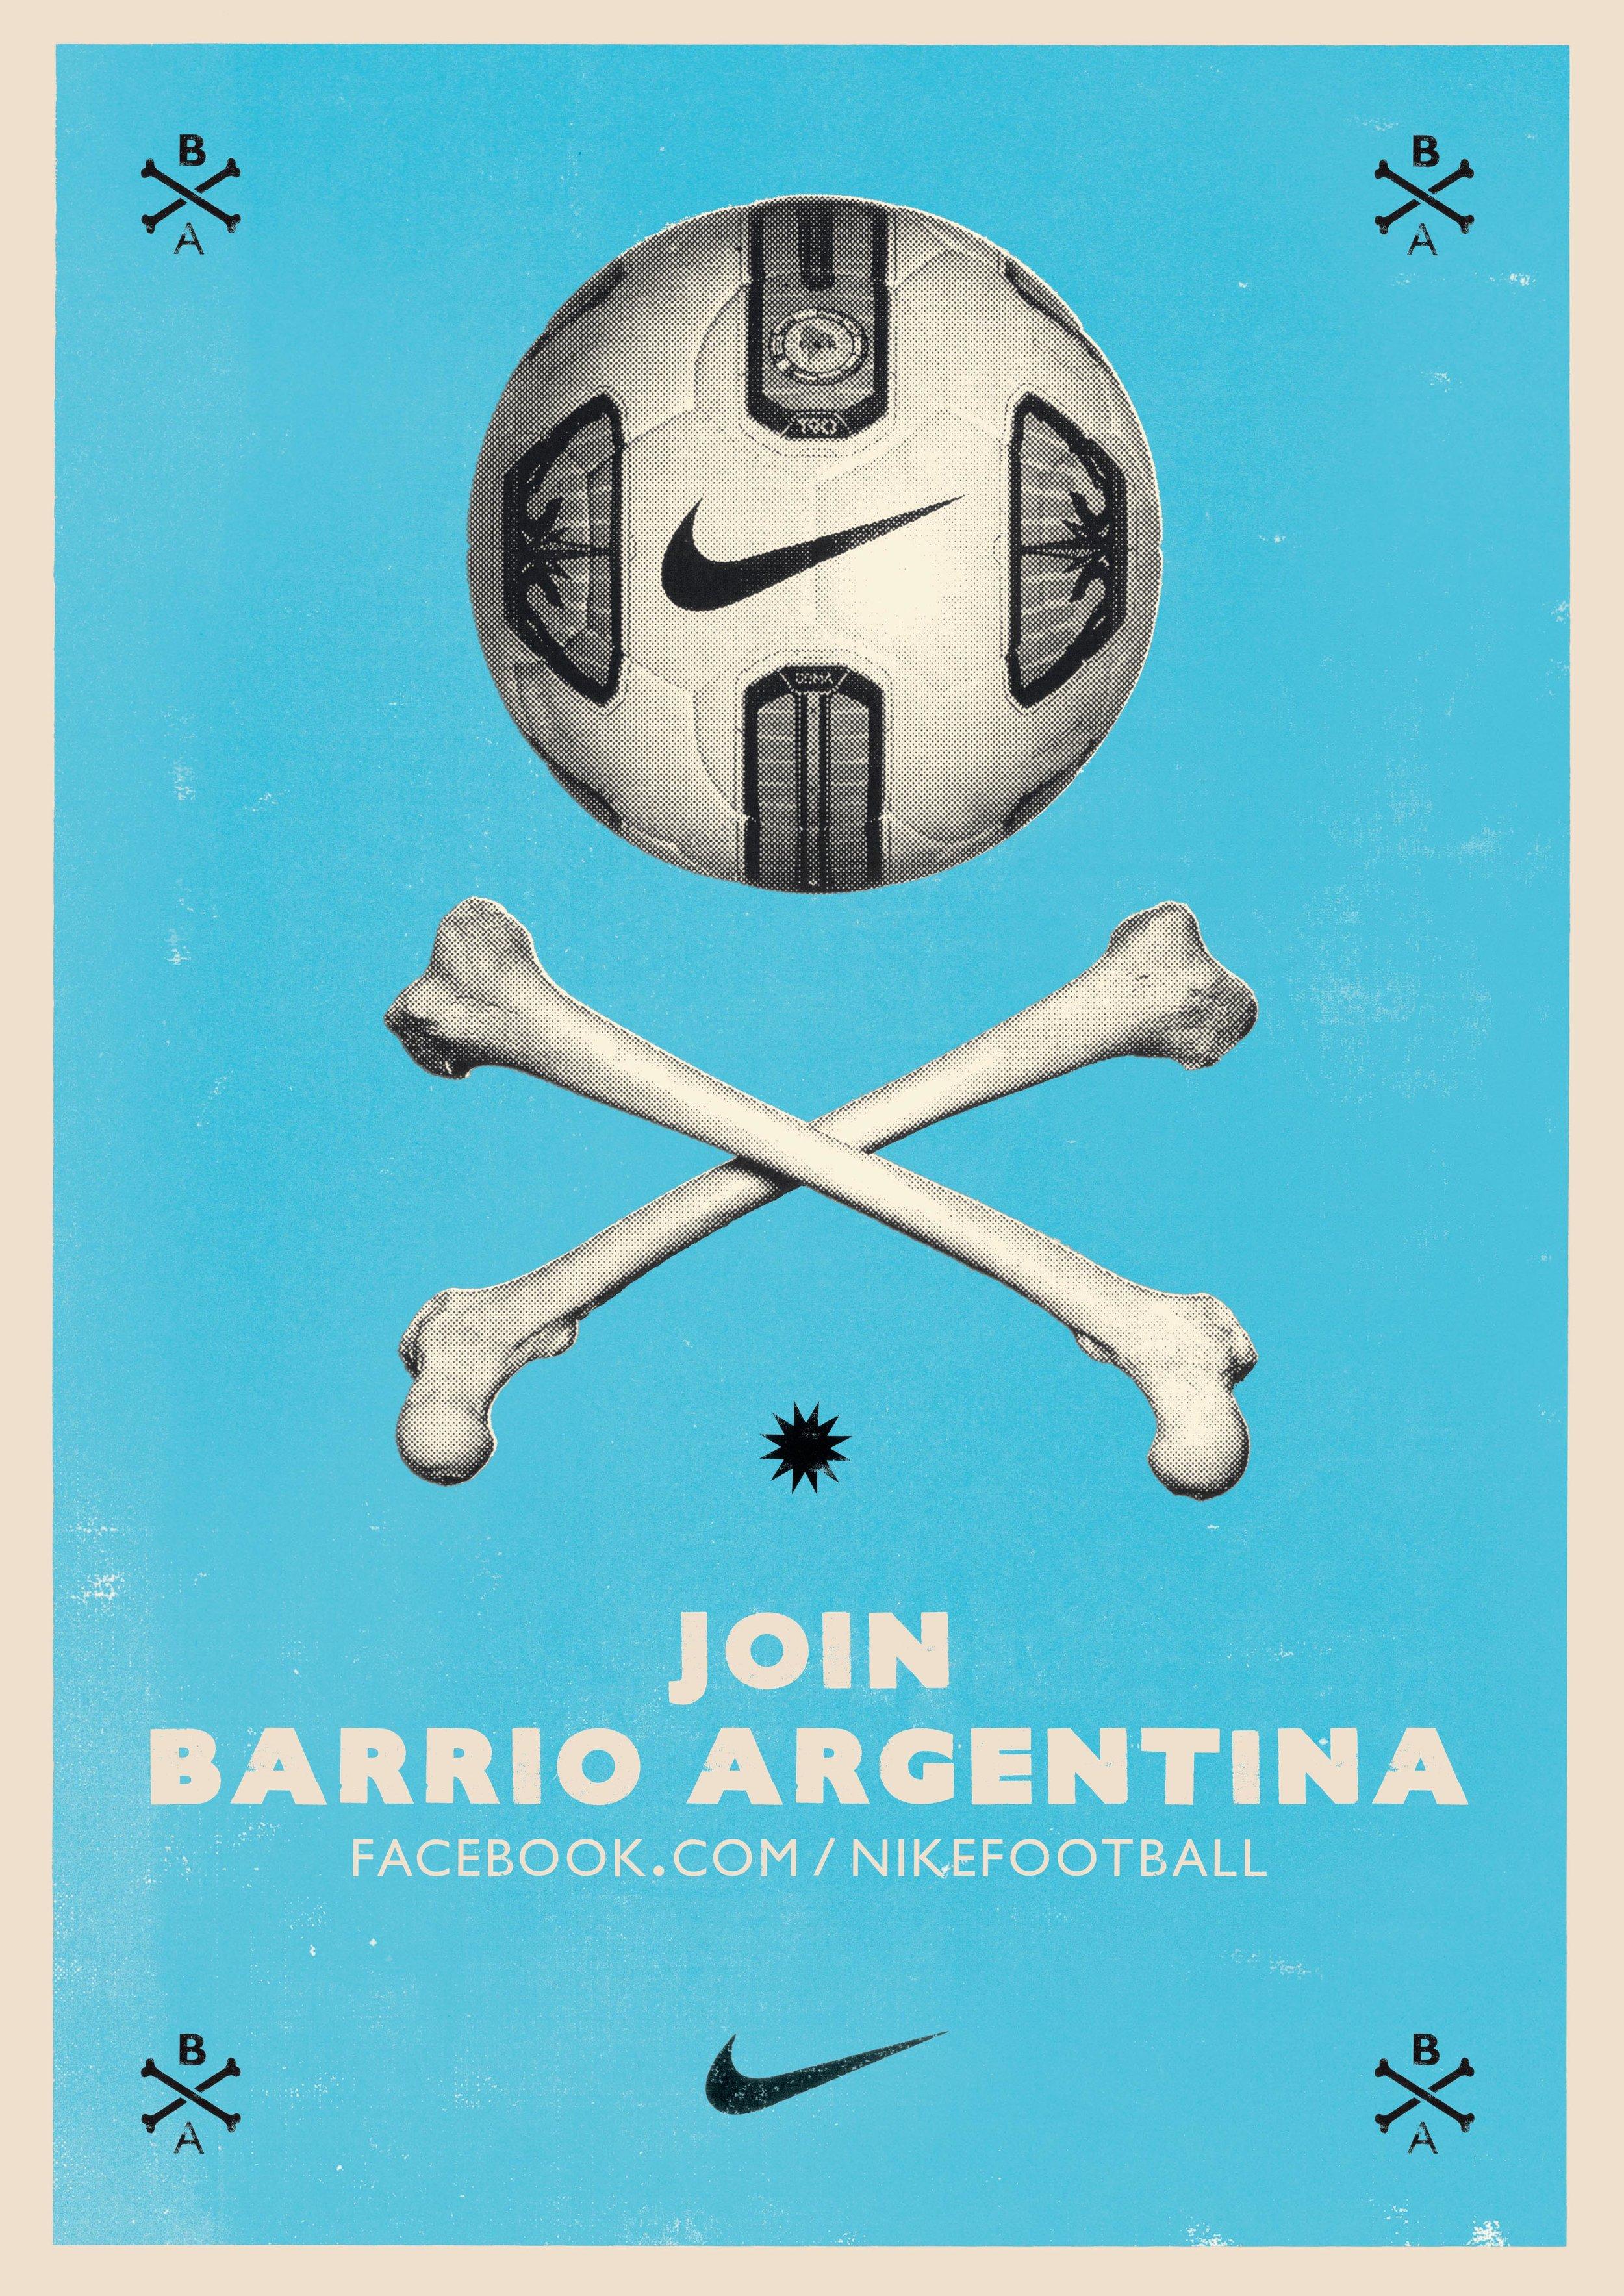 Copa_Join_Barrio_A3_Argentina.jpg